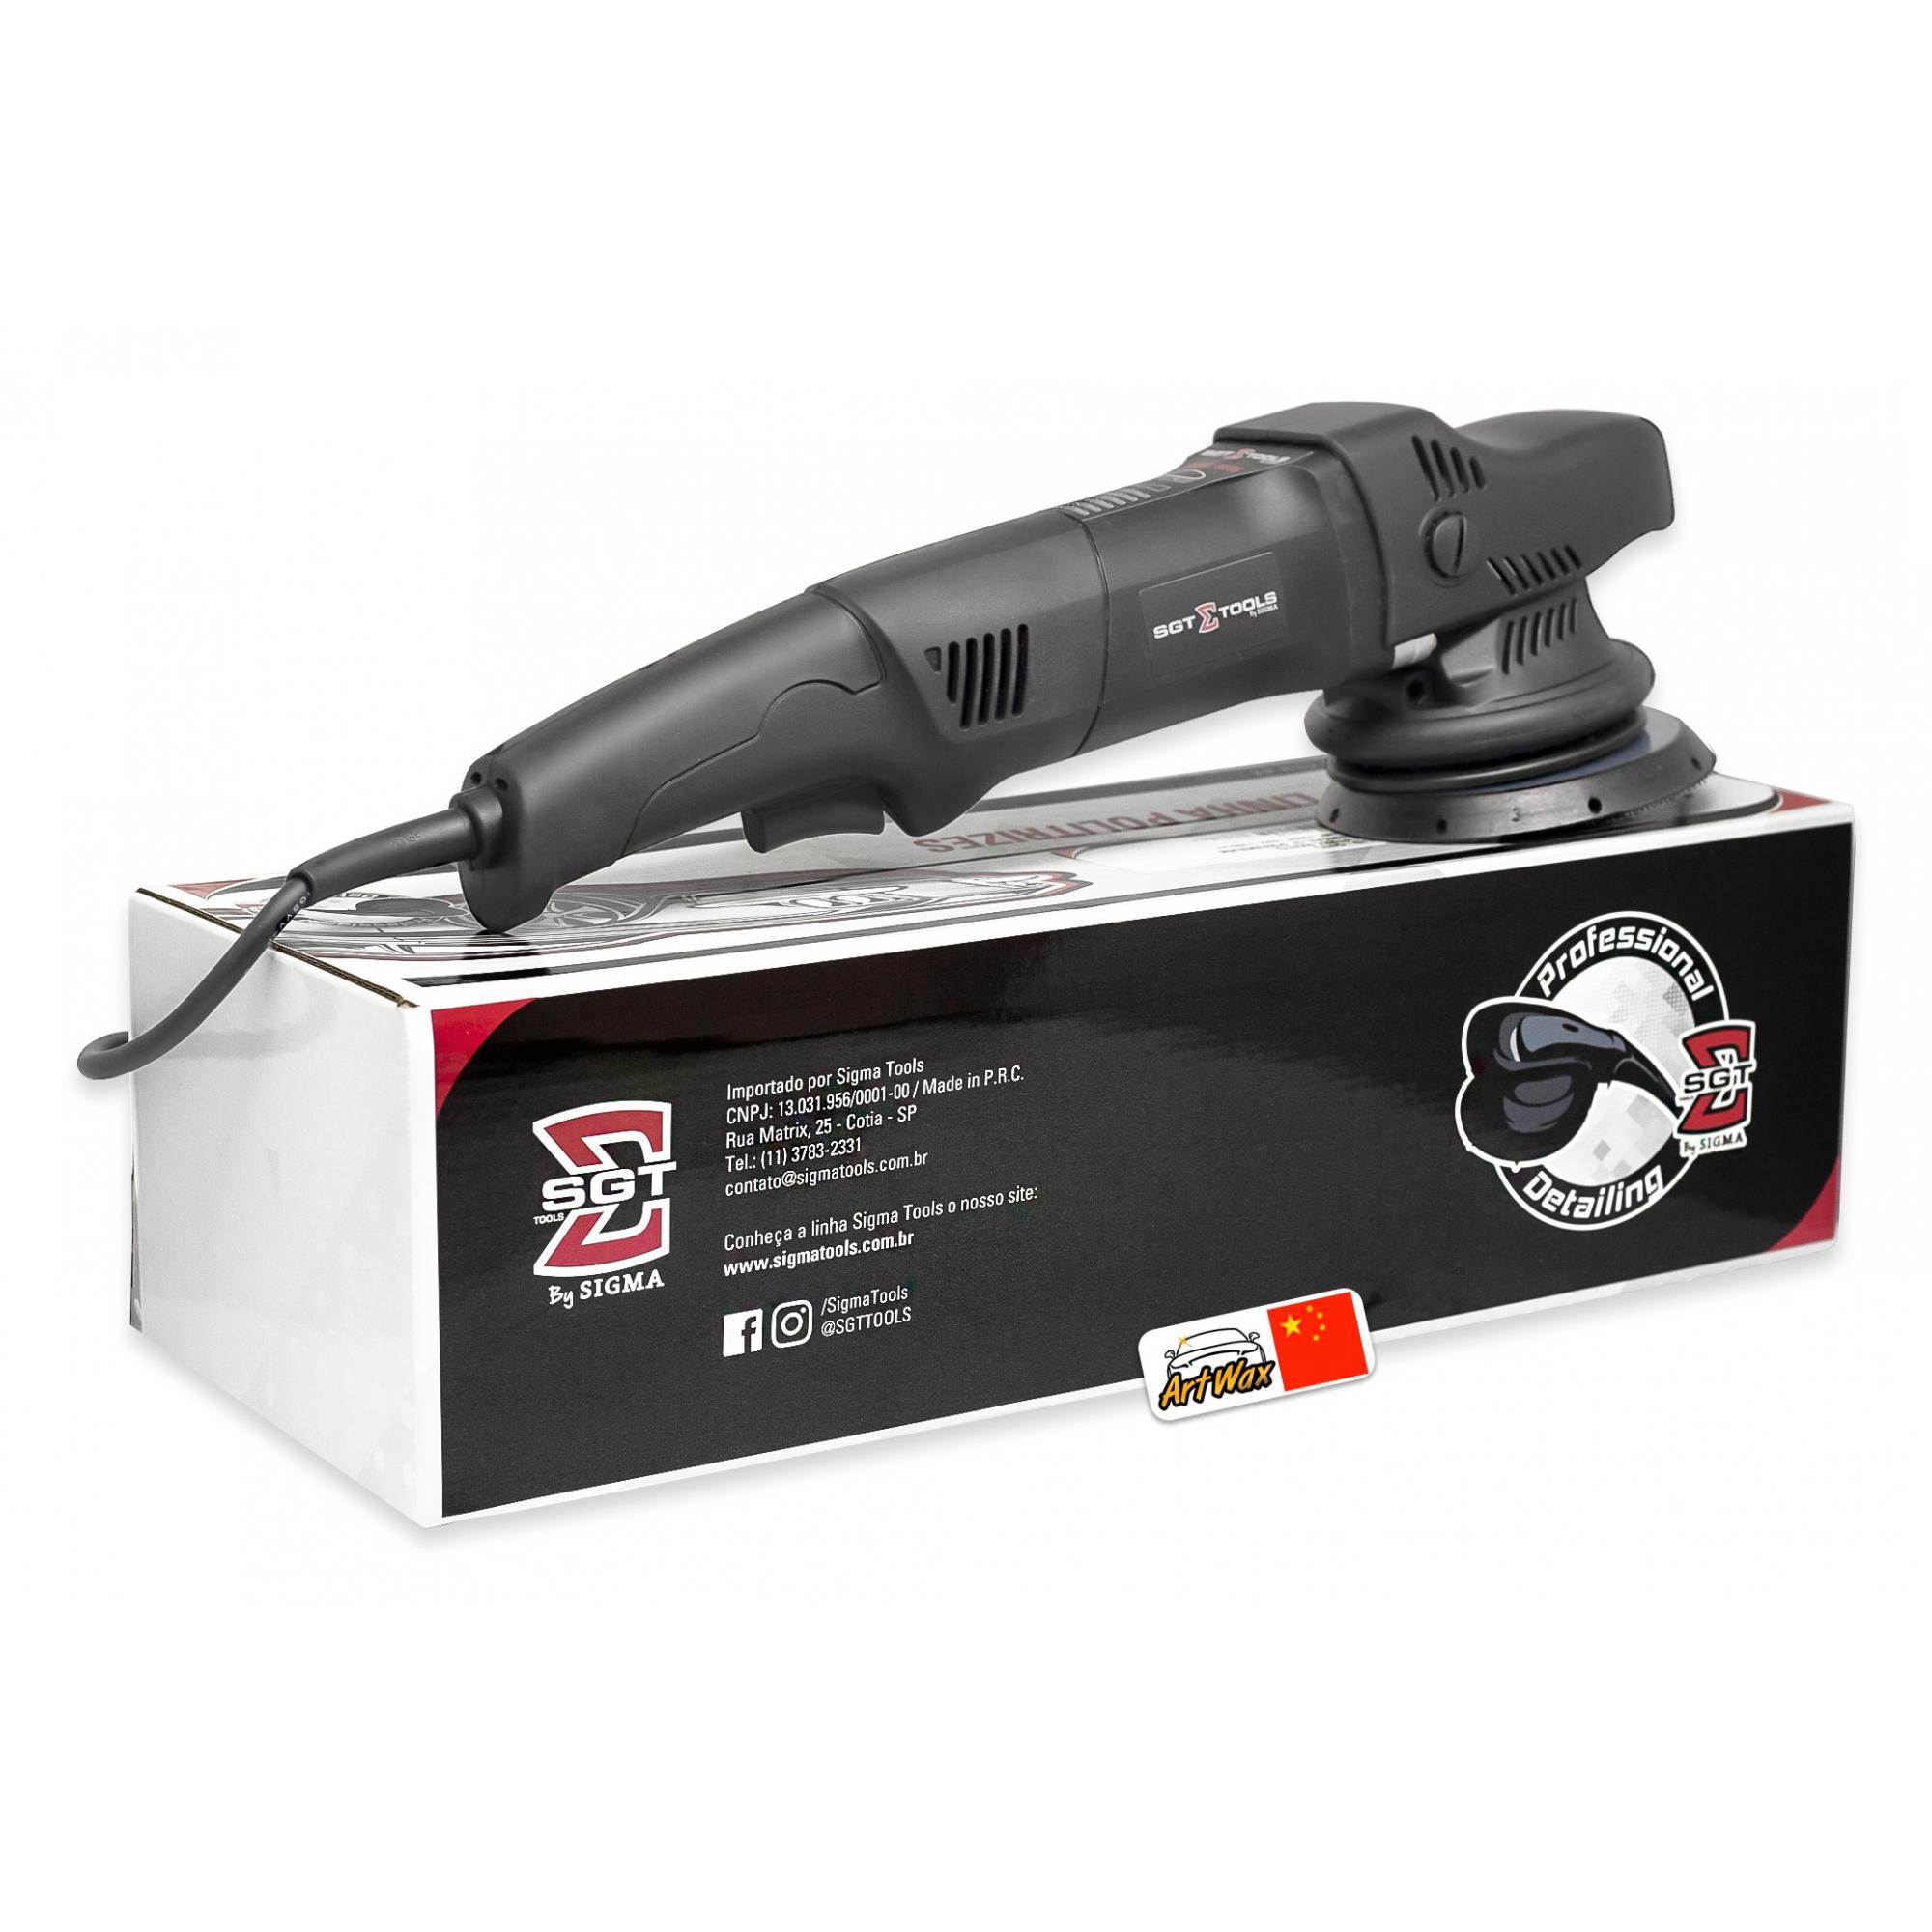 Politriz Roto Orbital 15mm Premium SGT 5115 - 220v 1200w Sigma Tools